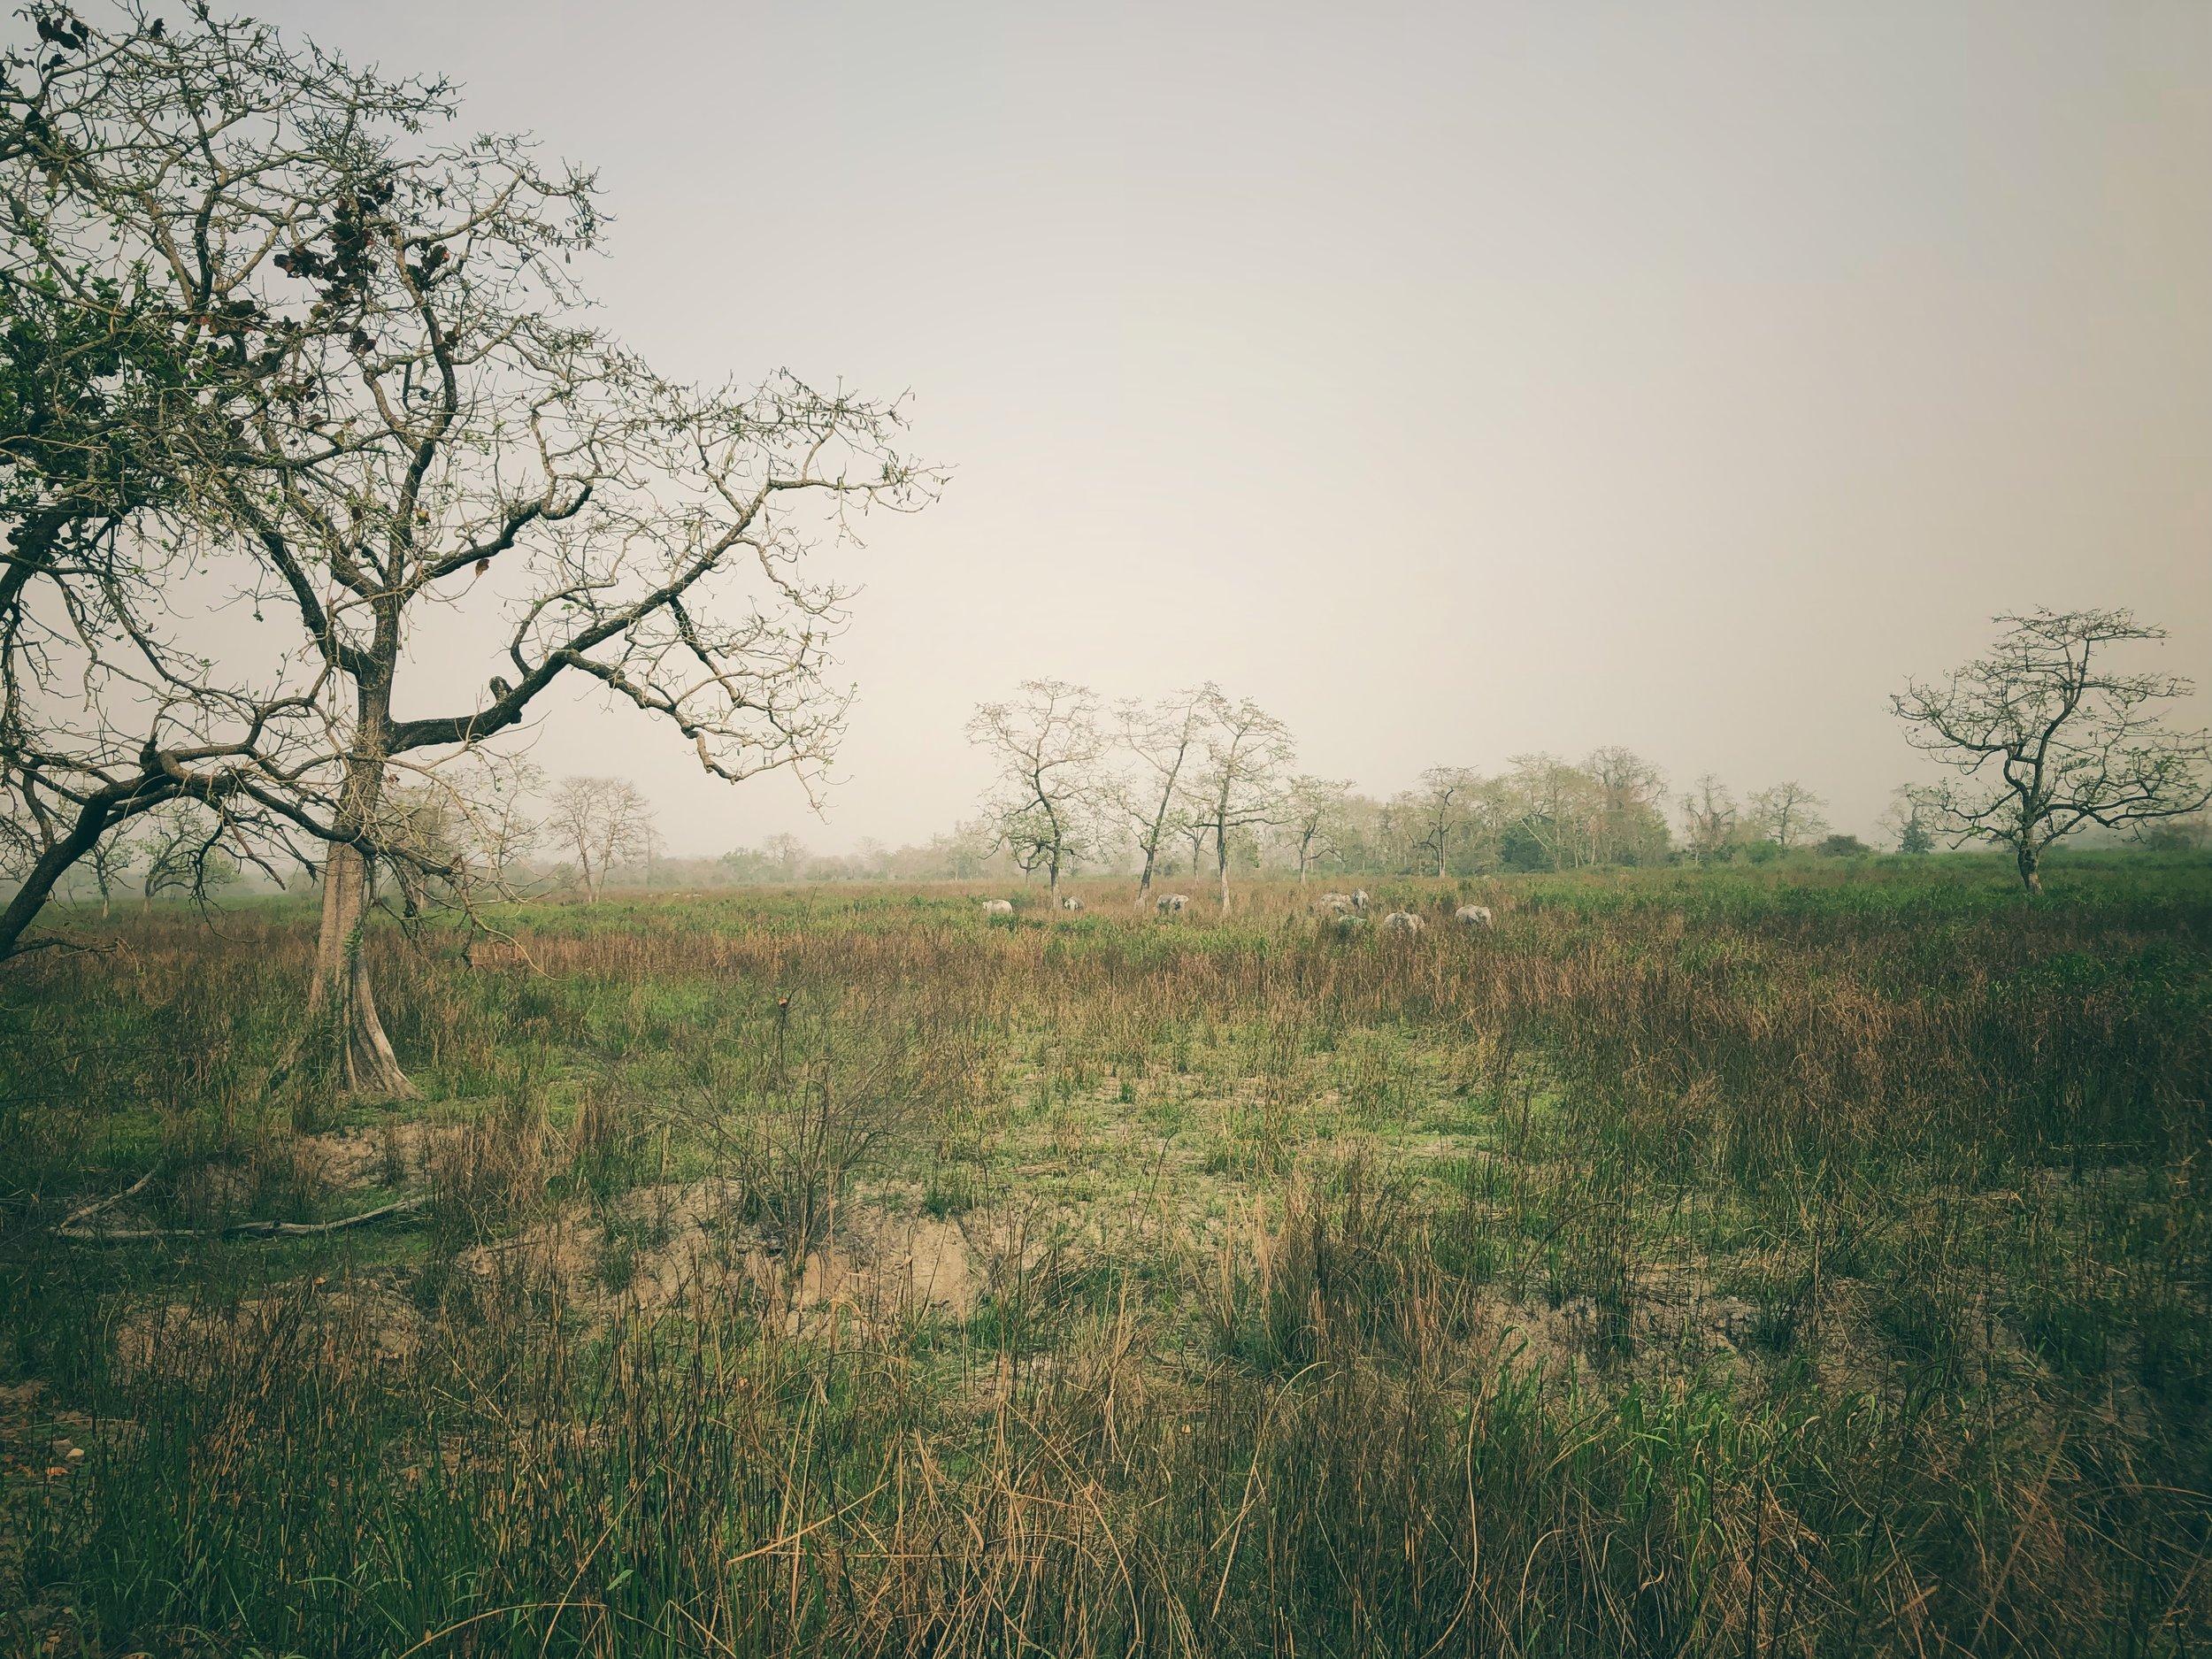 A herd of around 20 (distant) elephants